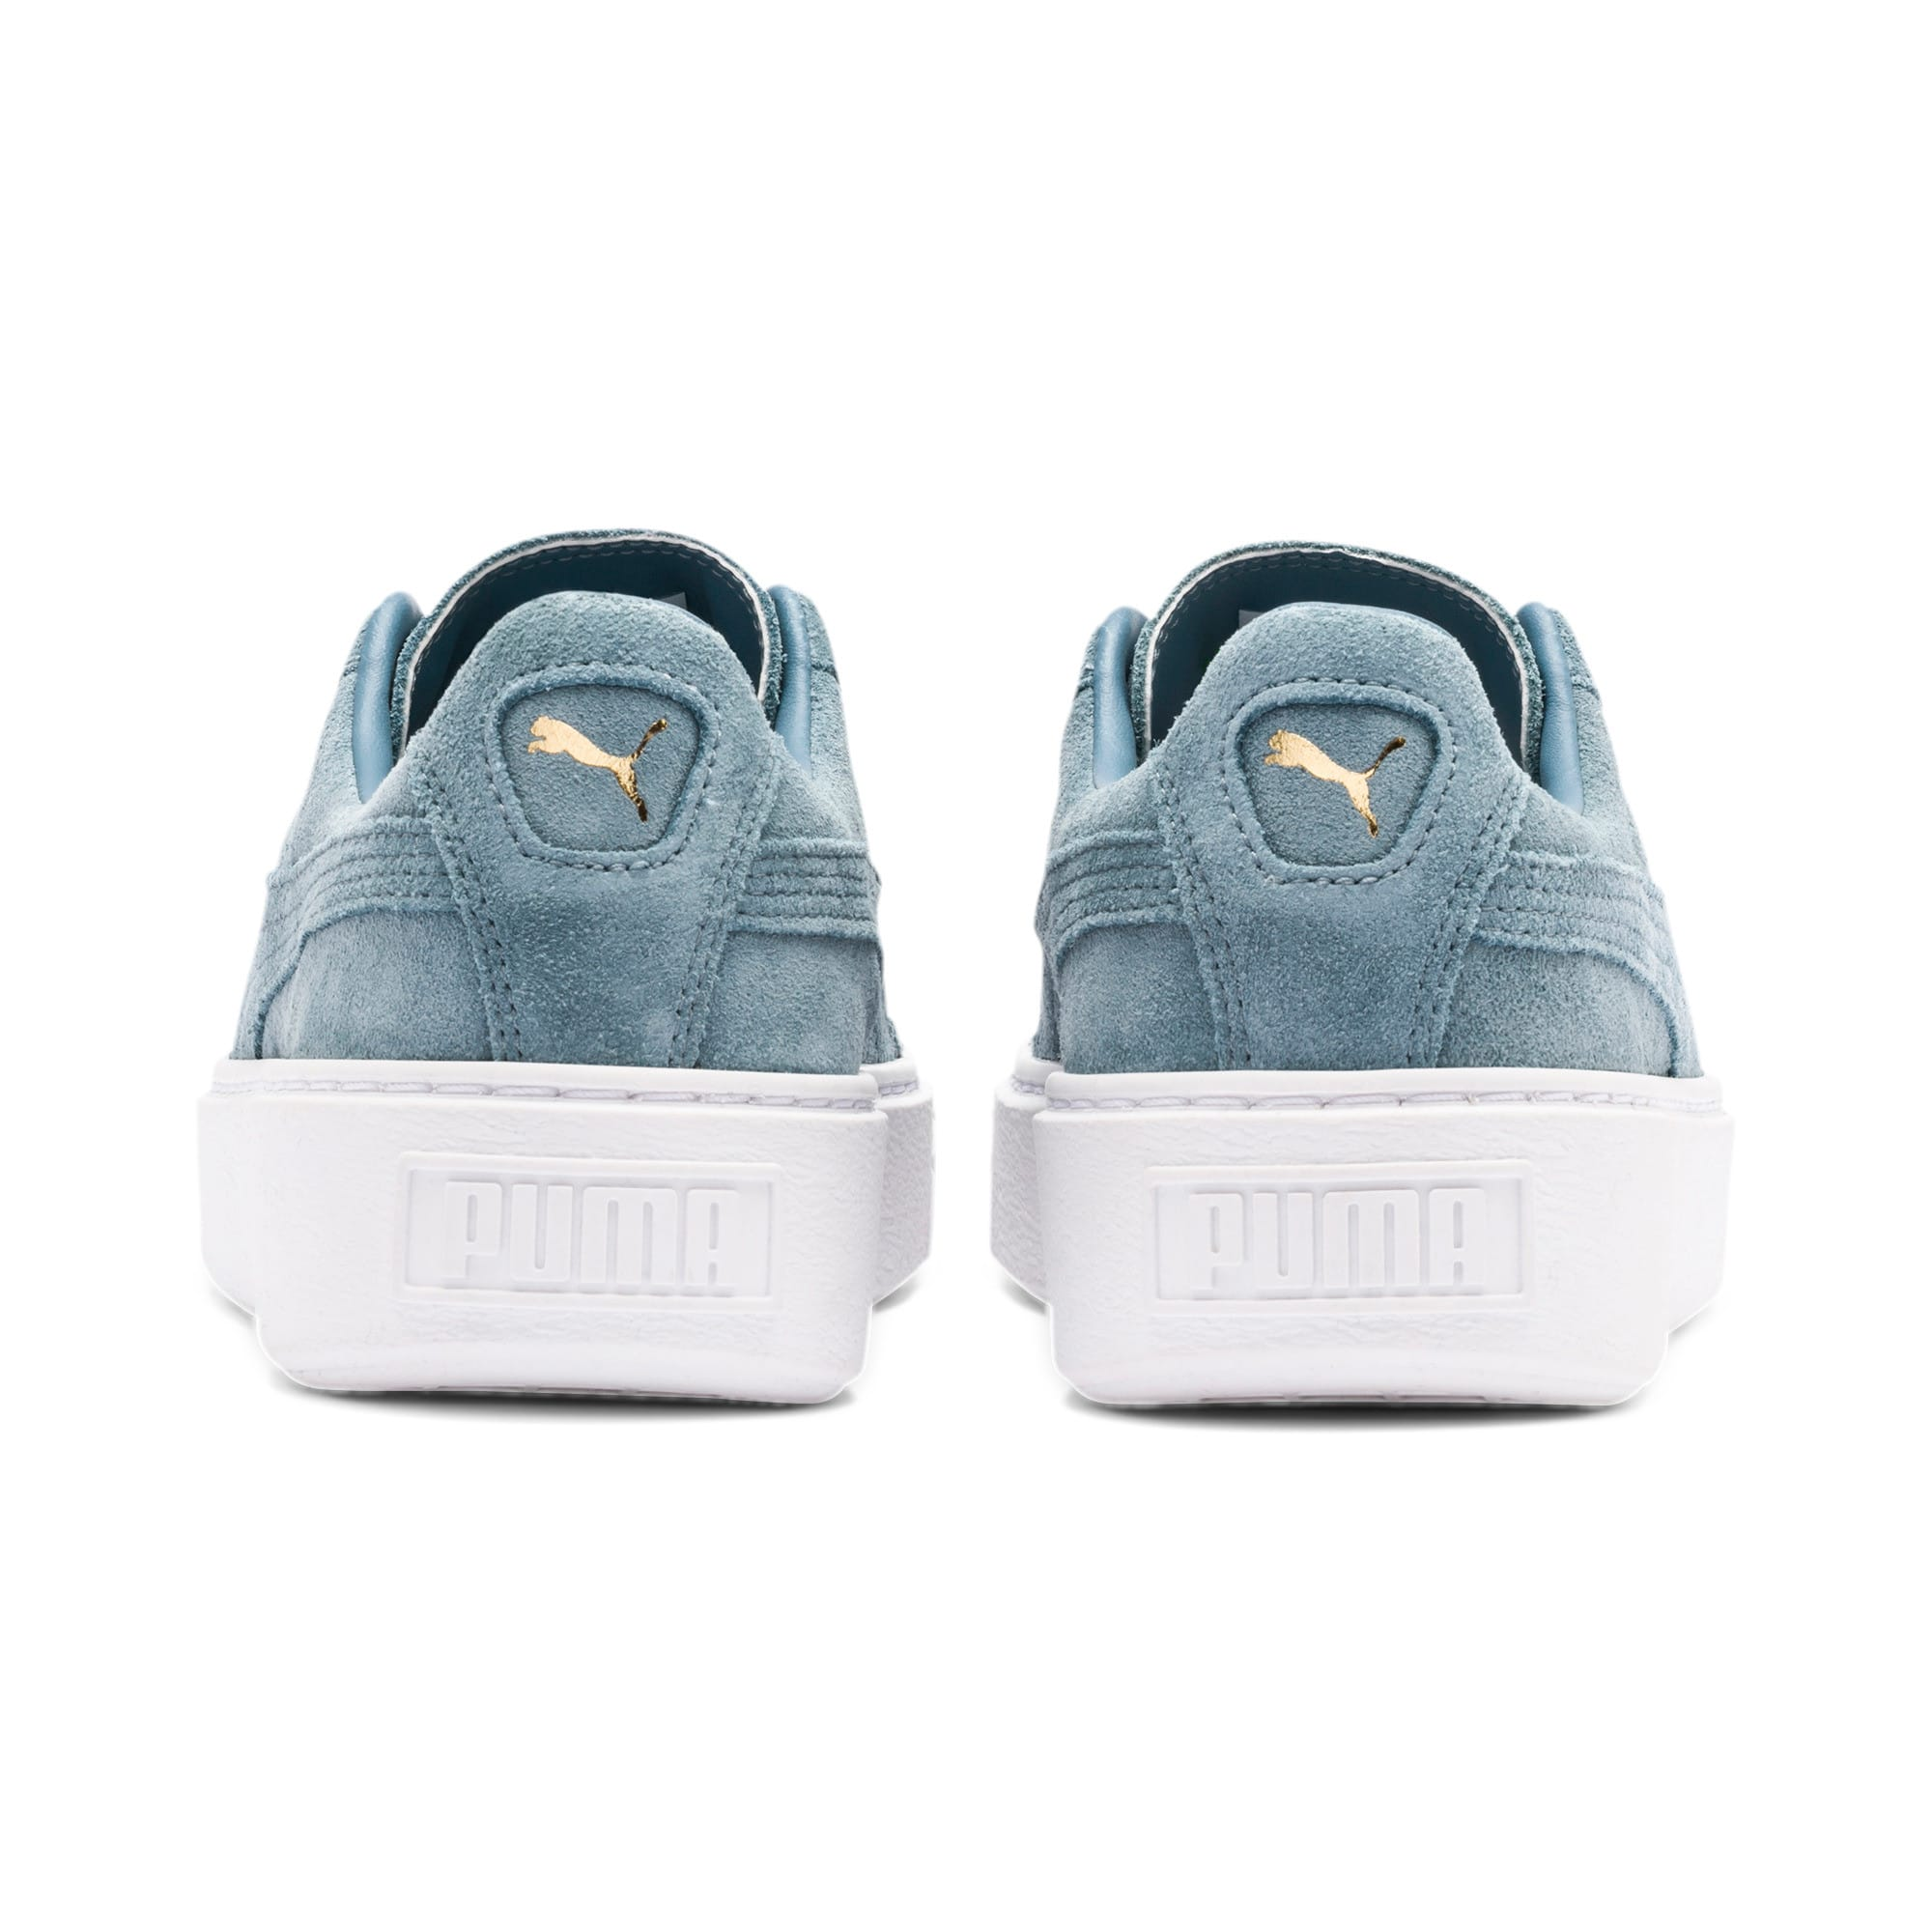 Thumbnail 5 of Suede Platform Women's Sneakers, Bluestone-Puma Team Gold, medium